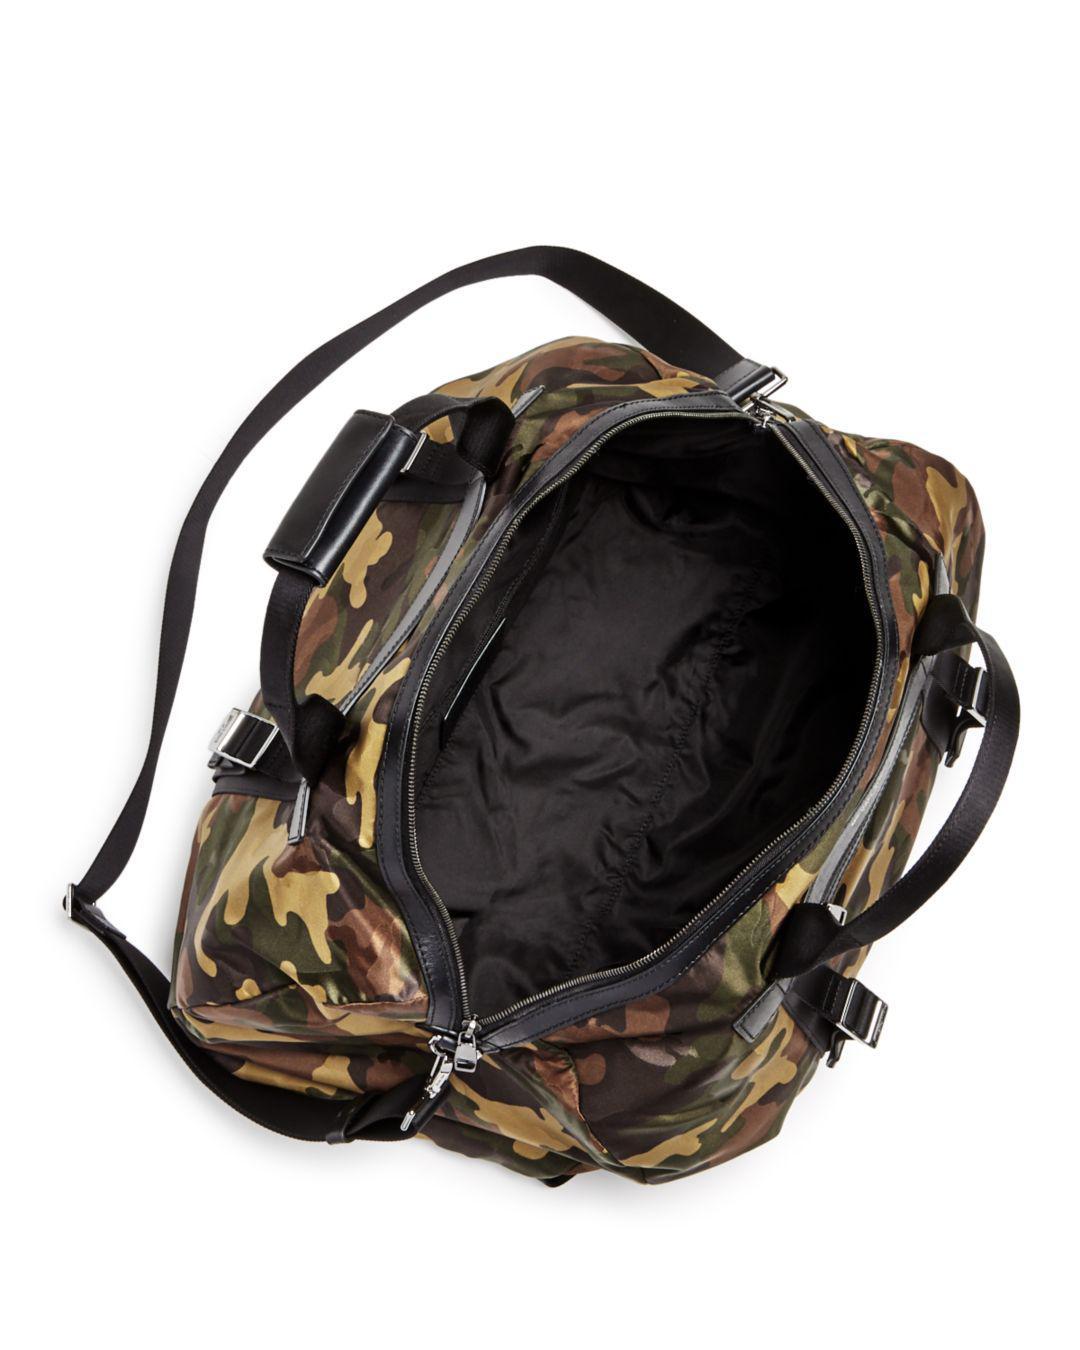 6c3498d1191bd Lyst - Michael Kors Kent Camo-print Nylon Convertible Duffel Bag in Green  for Men